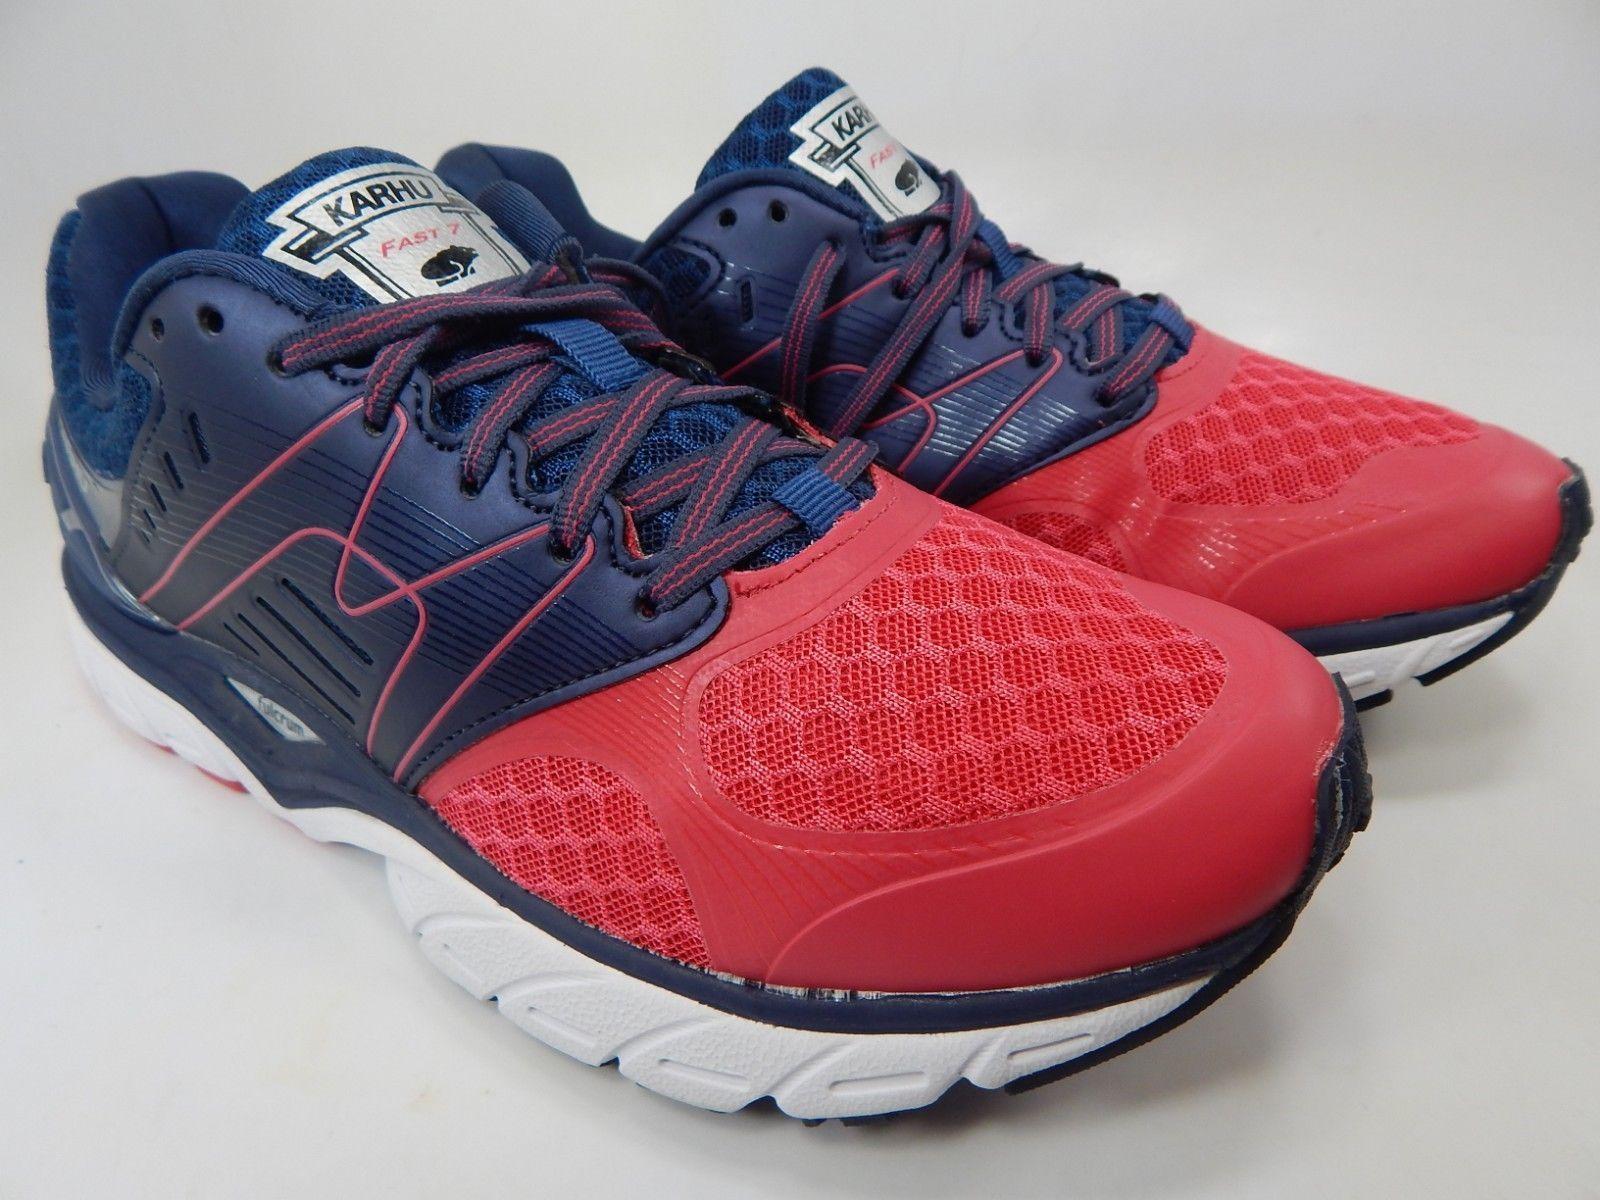 Karhu Women S Athletic Shoes